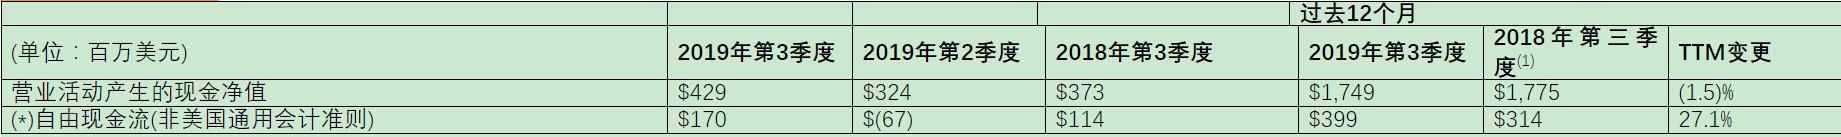 ST公布2019年第三季度财报